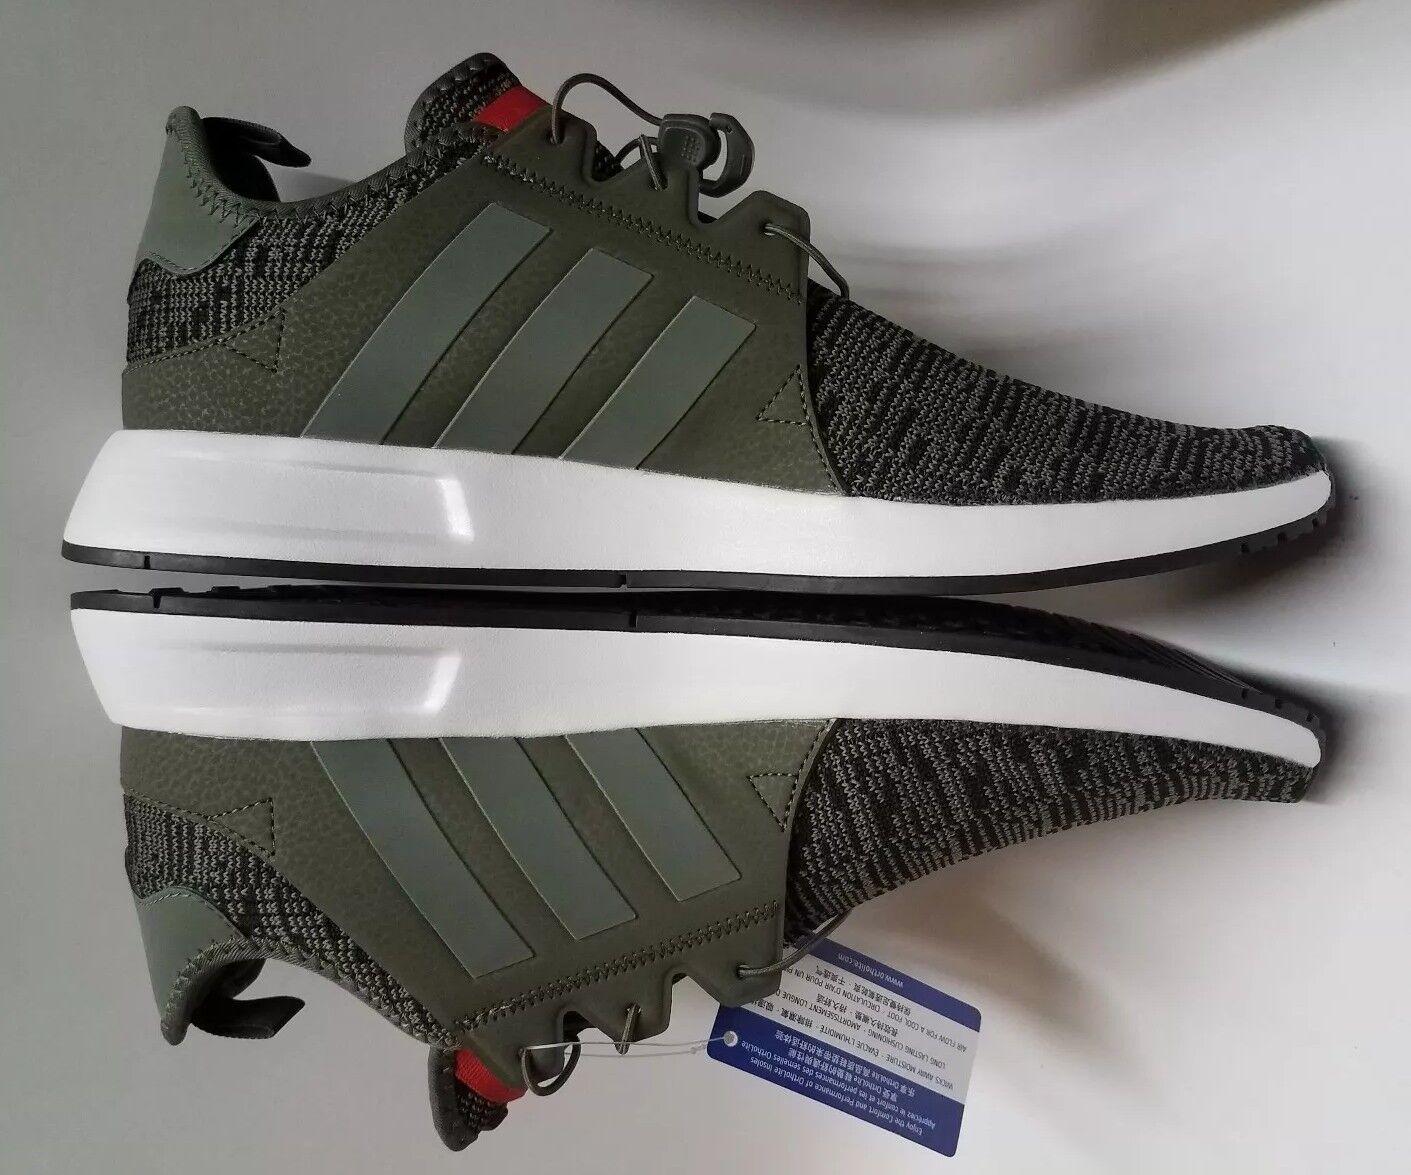 Adidas Adidas Adidas Mens Size 11.5 Originals X_PLR Green Black Running Training shoes New 8a09ad